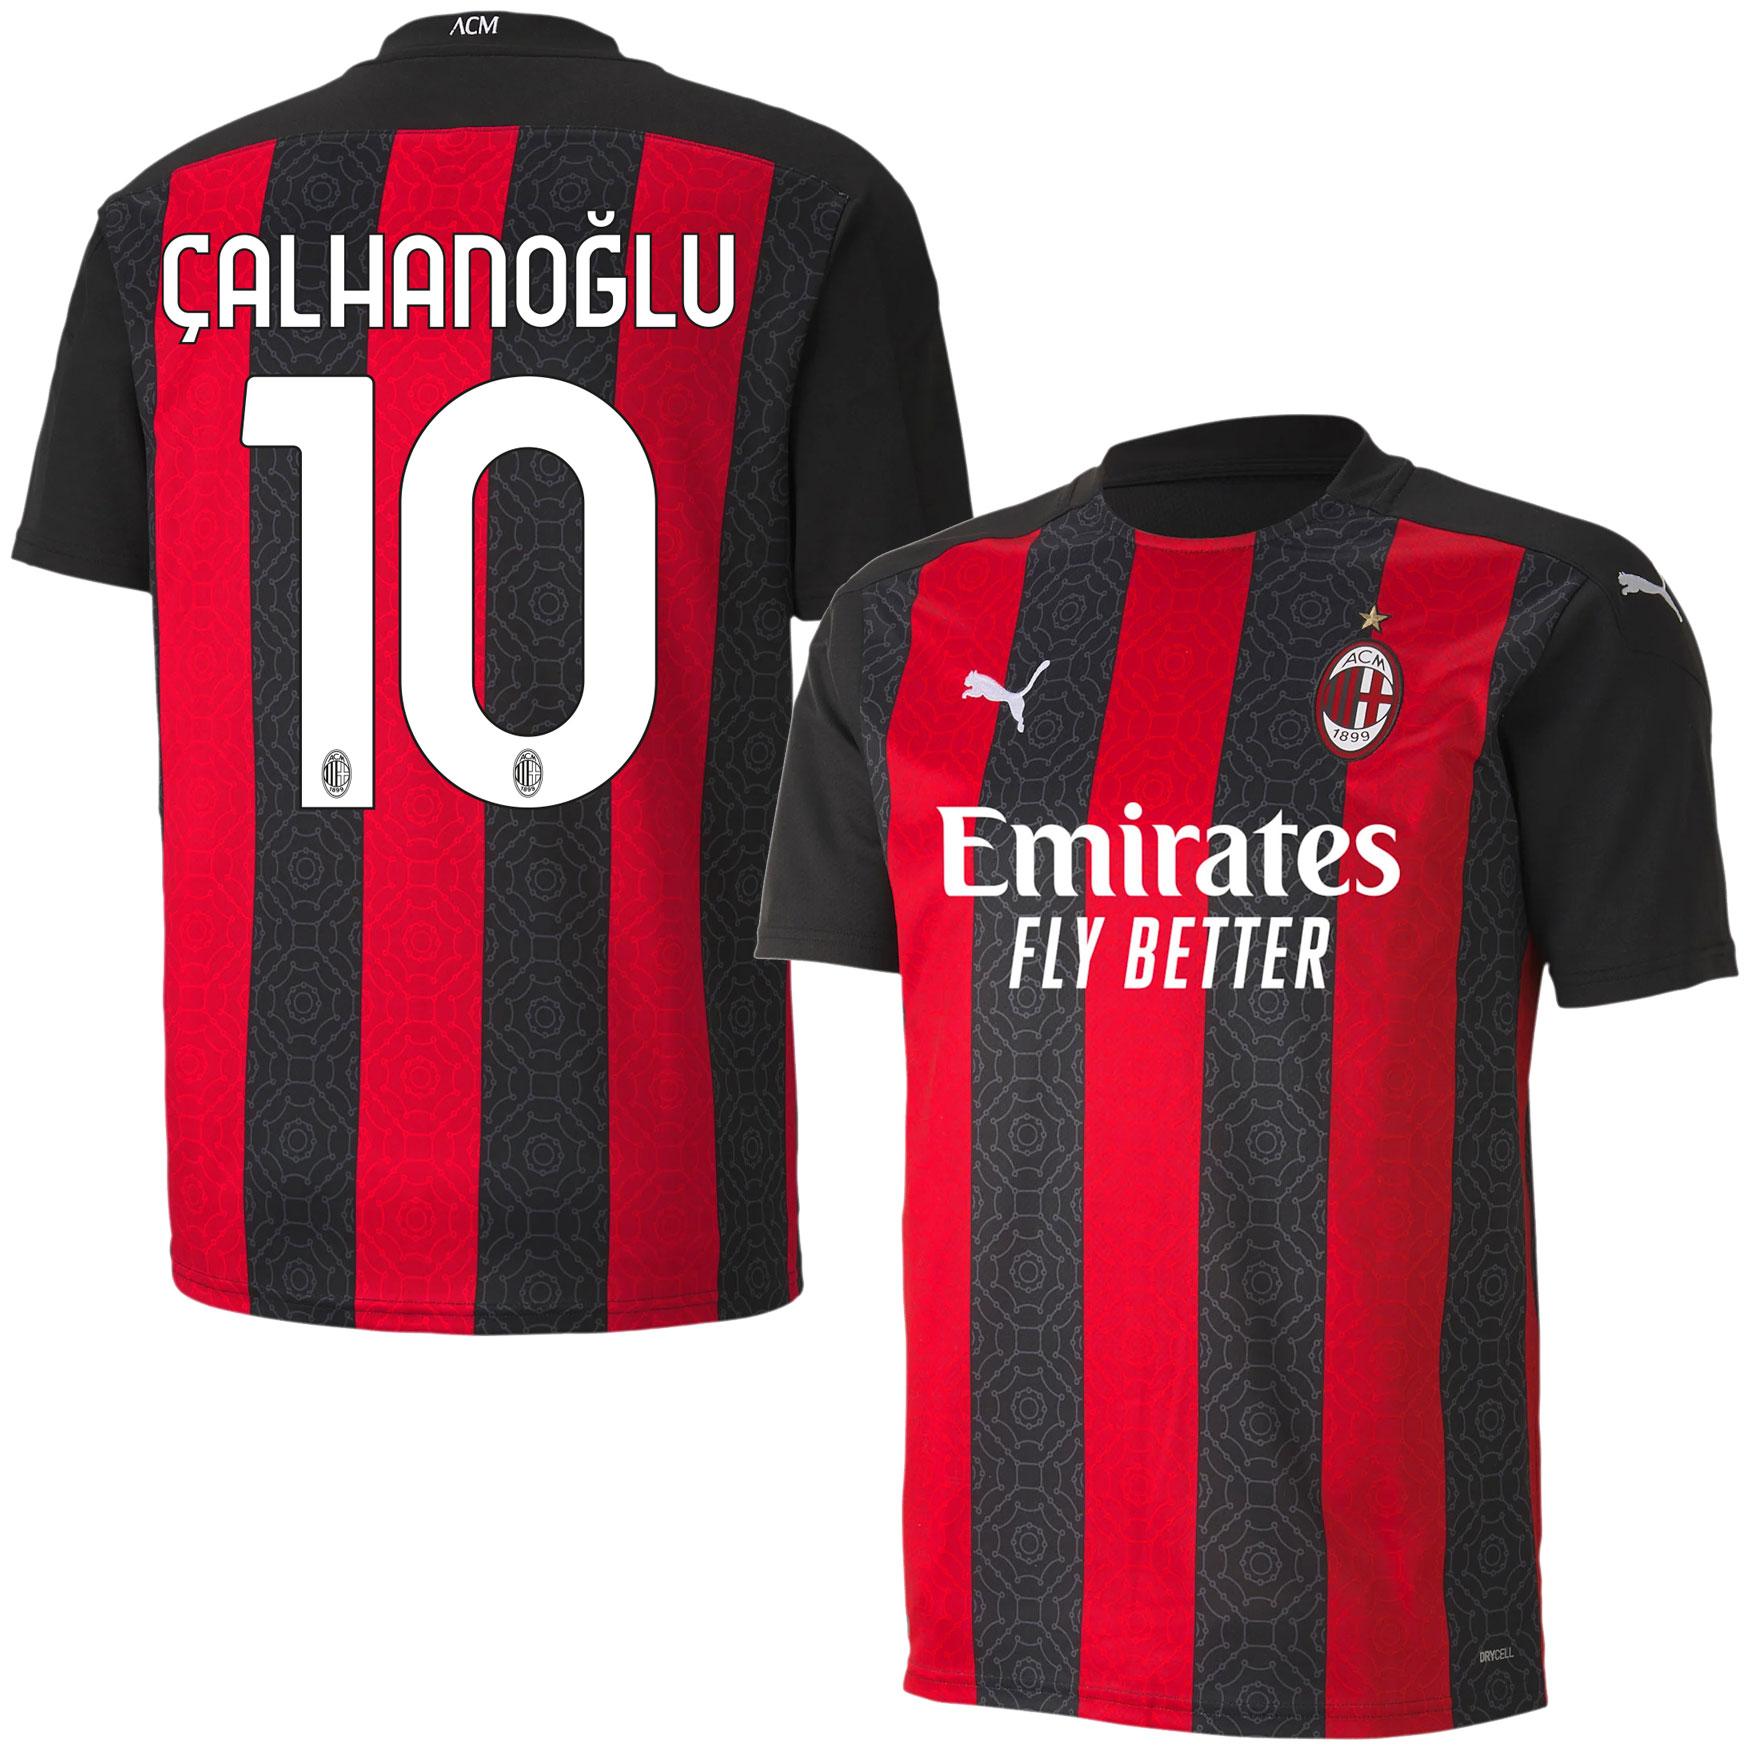 AC Milan Shirt Thuis 2020-2021 + Calhanoglu 10